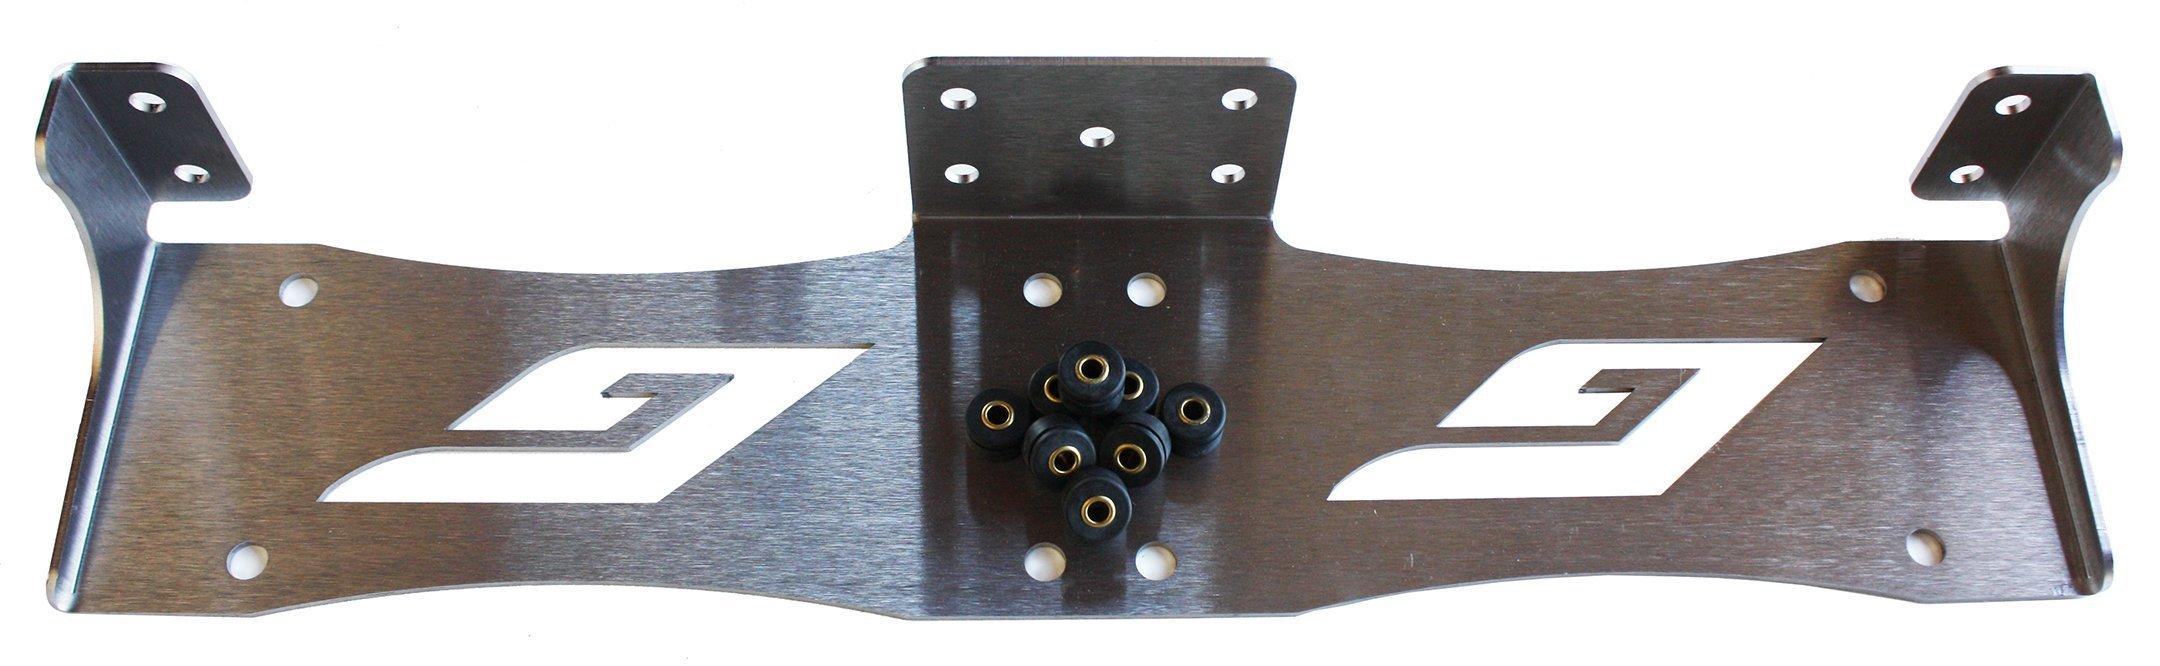 Grunion Dual Compressor Mounting Bracket for Viair 444C/480C Air Ride Suspension